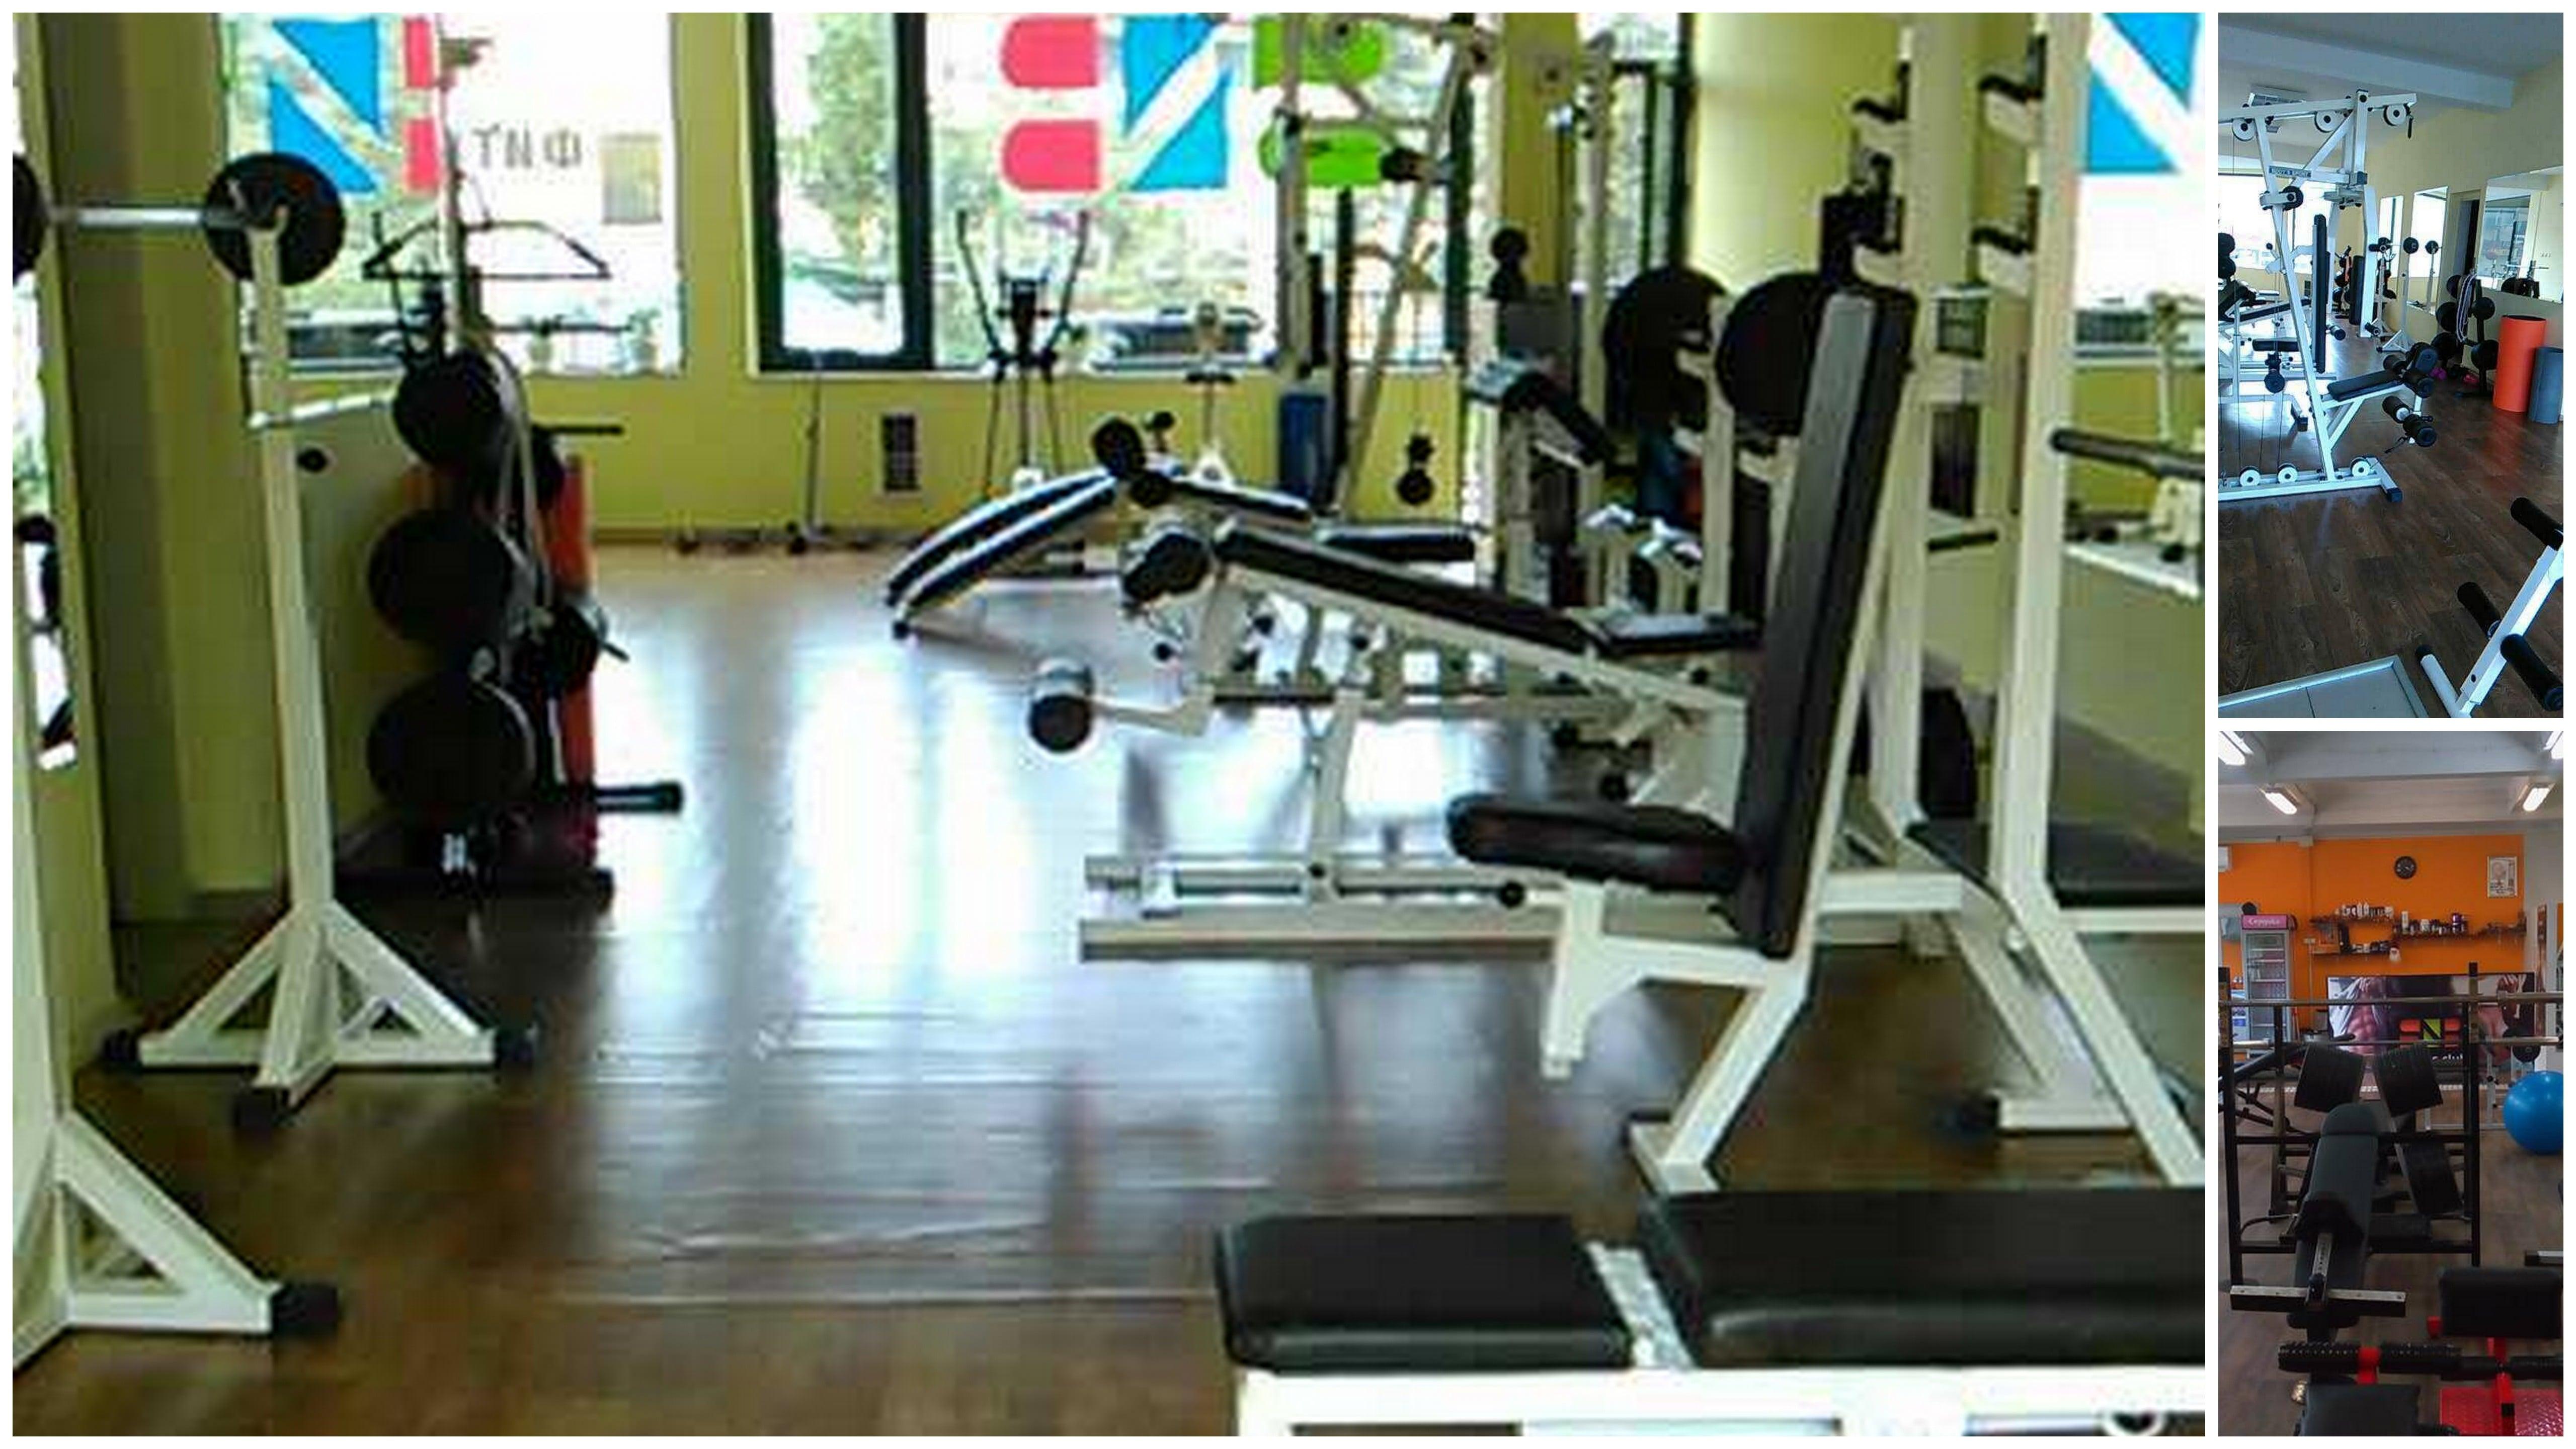 Фитнес клуб Strong New Body, гр. Горна Оряховица